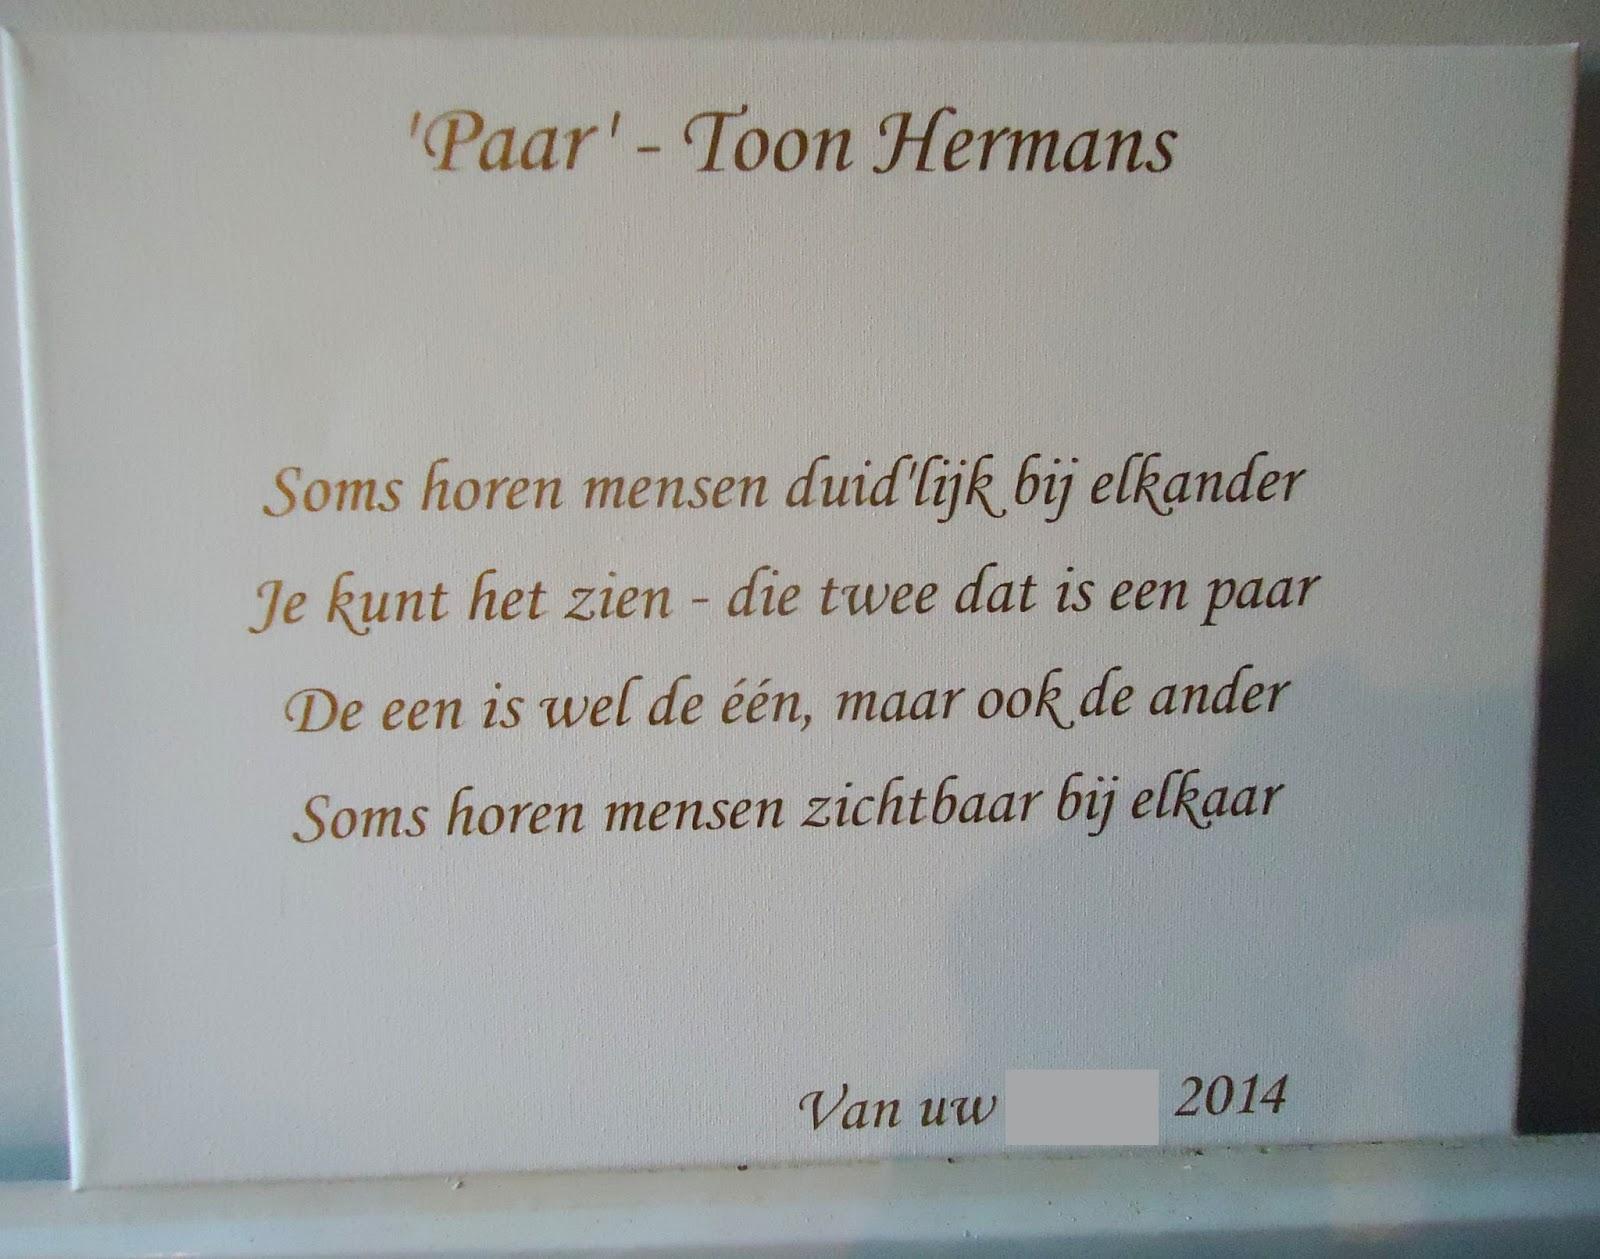 gedicht 25 jaar getrouwd toon hermans Fabulous Gedicht 25 Jaar Getrouwd Toon Hermans &CA57  gedicht 25 jaar getrouwd toon hermans